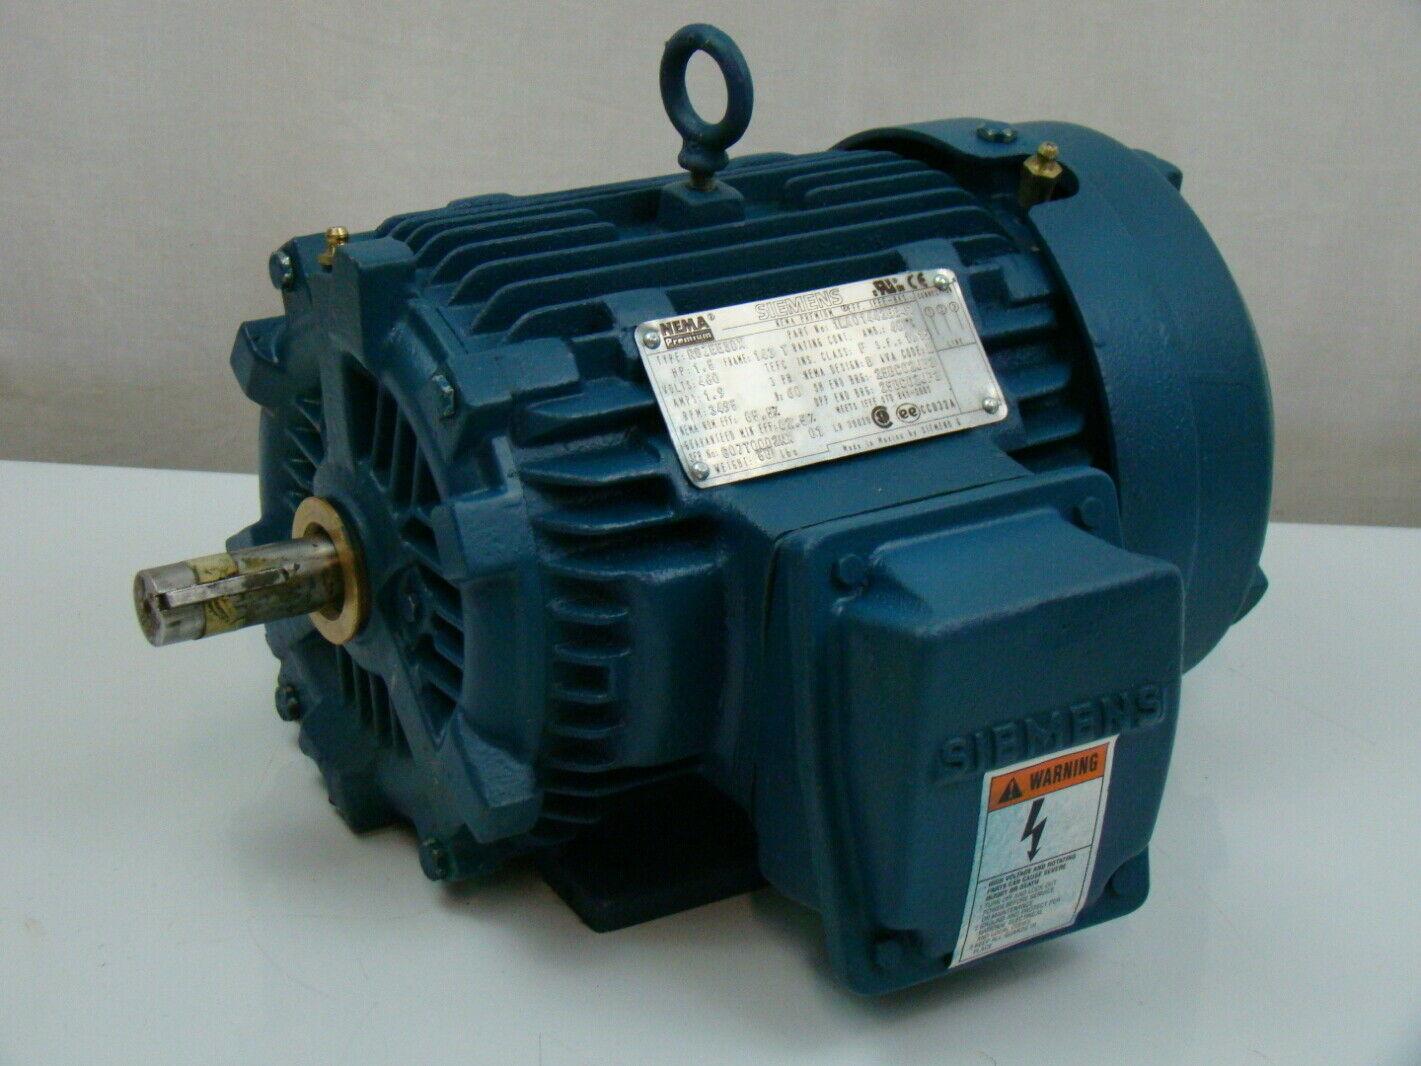 Siemens 1 5 Hp 460v Electric Motor 1la014423341 Ebay